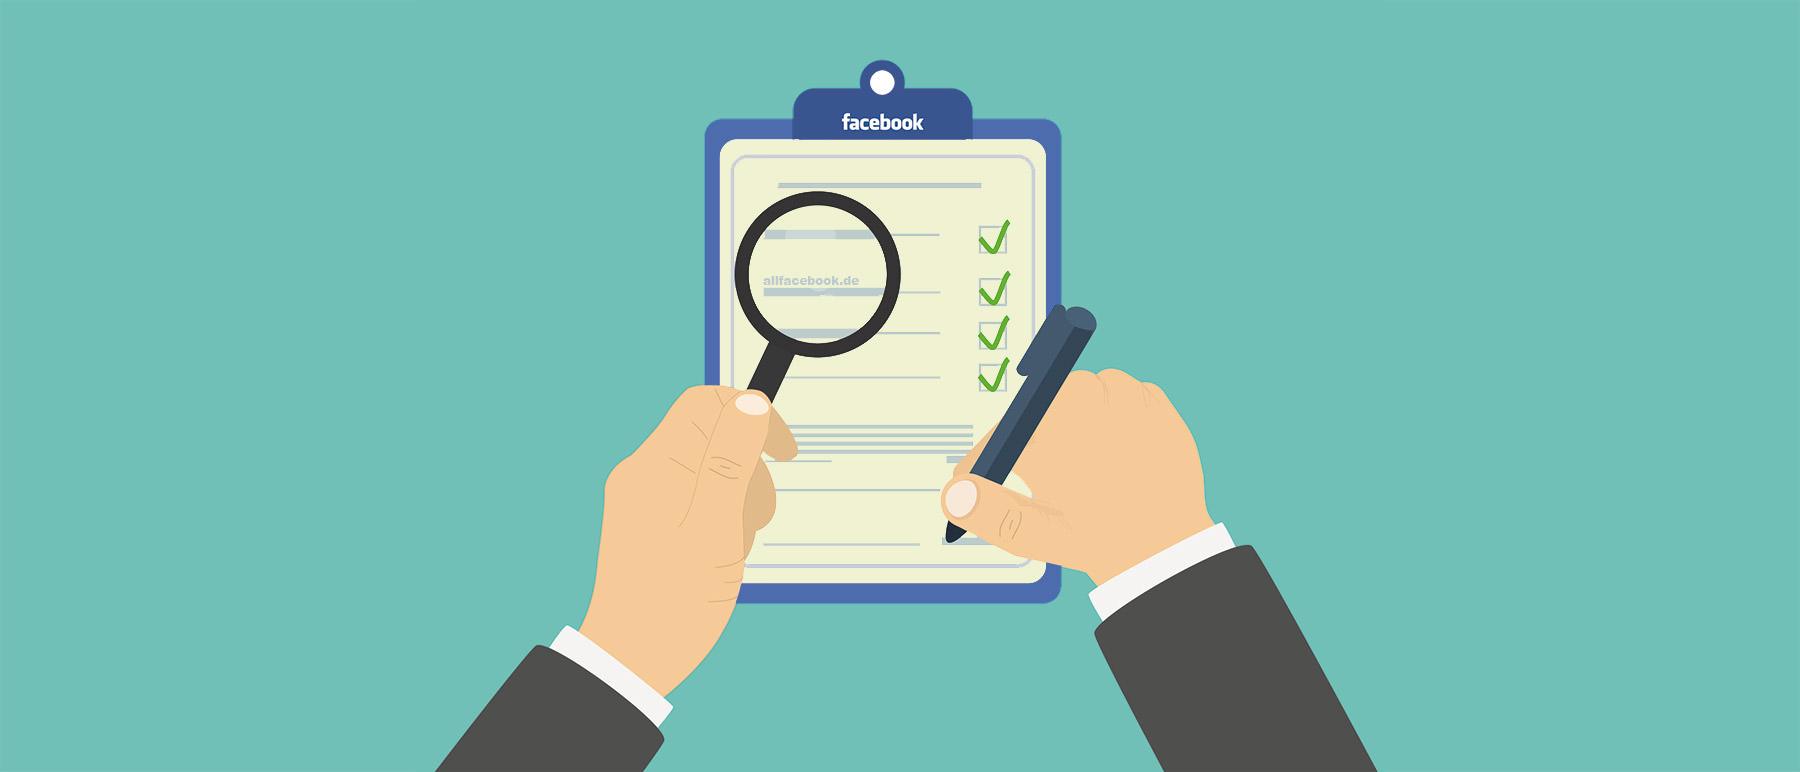 Facebook-Pages-Checkliste